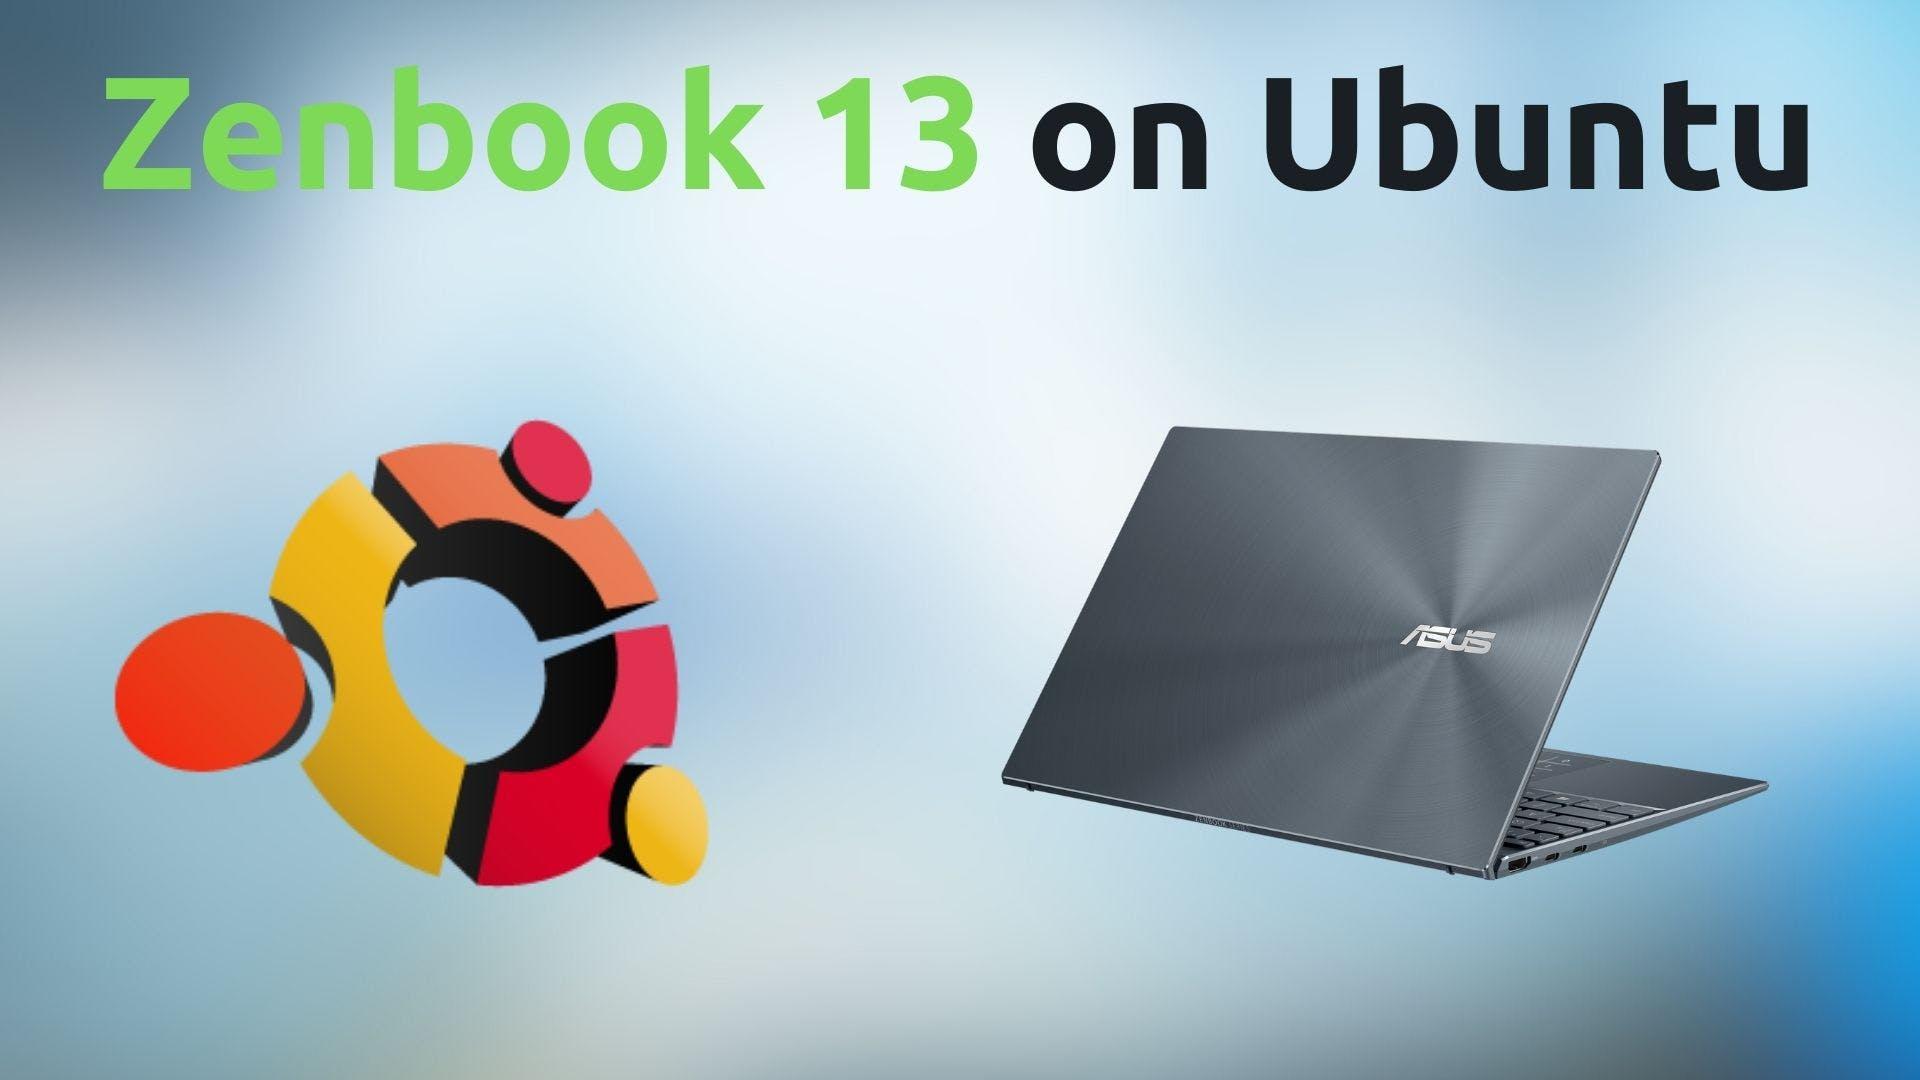 zenbook 13 and ubuntu logo